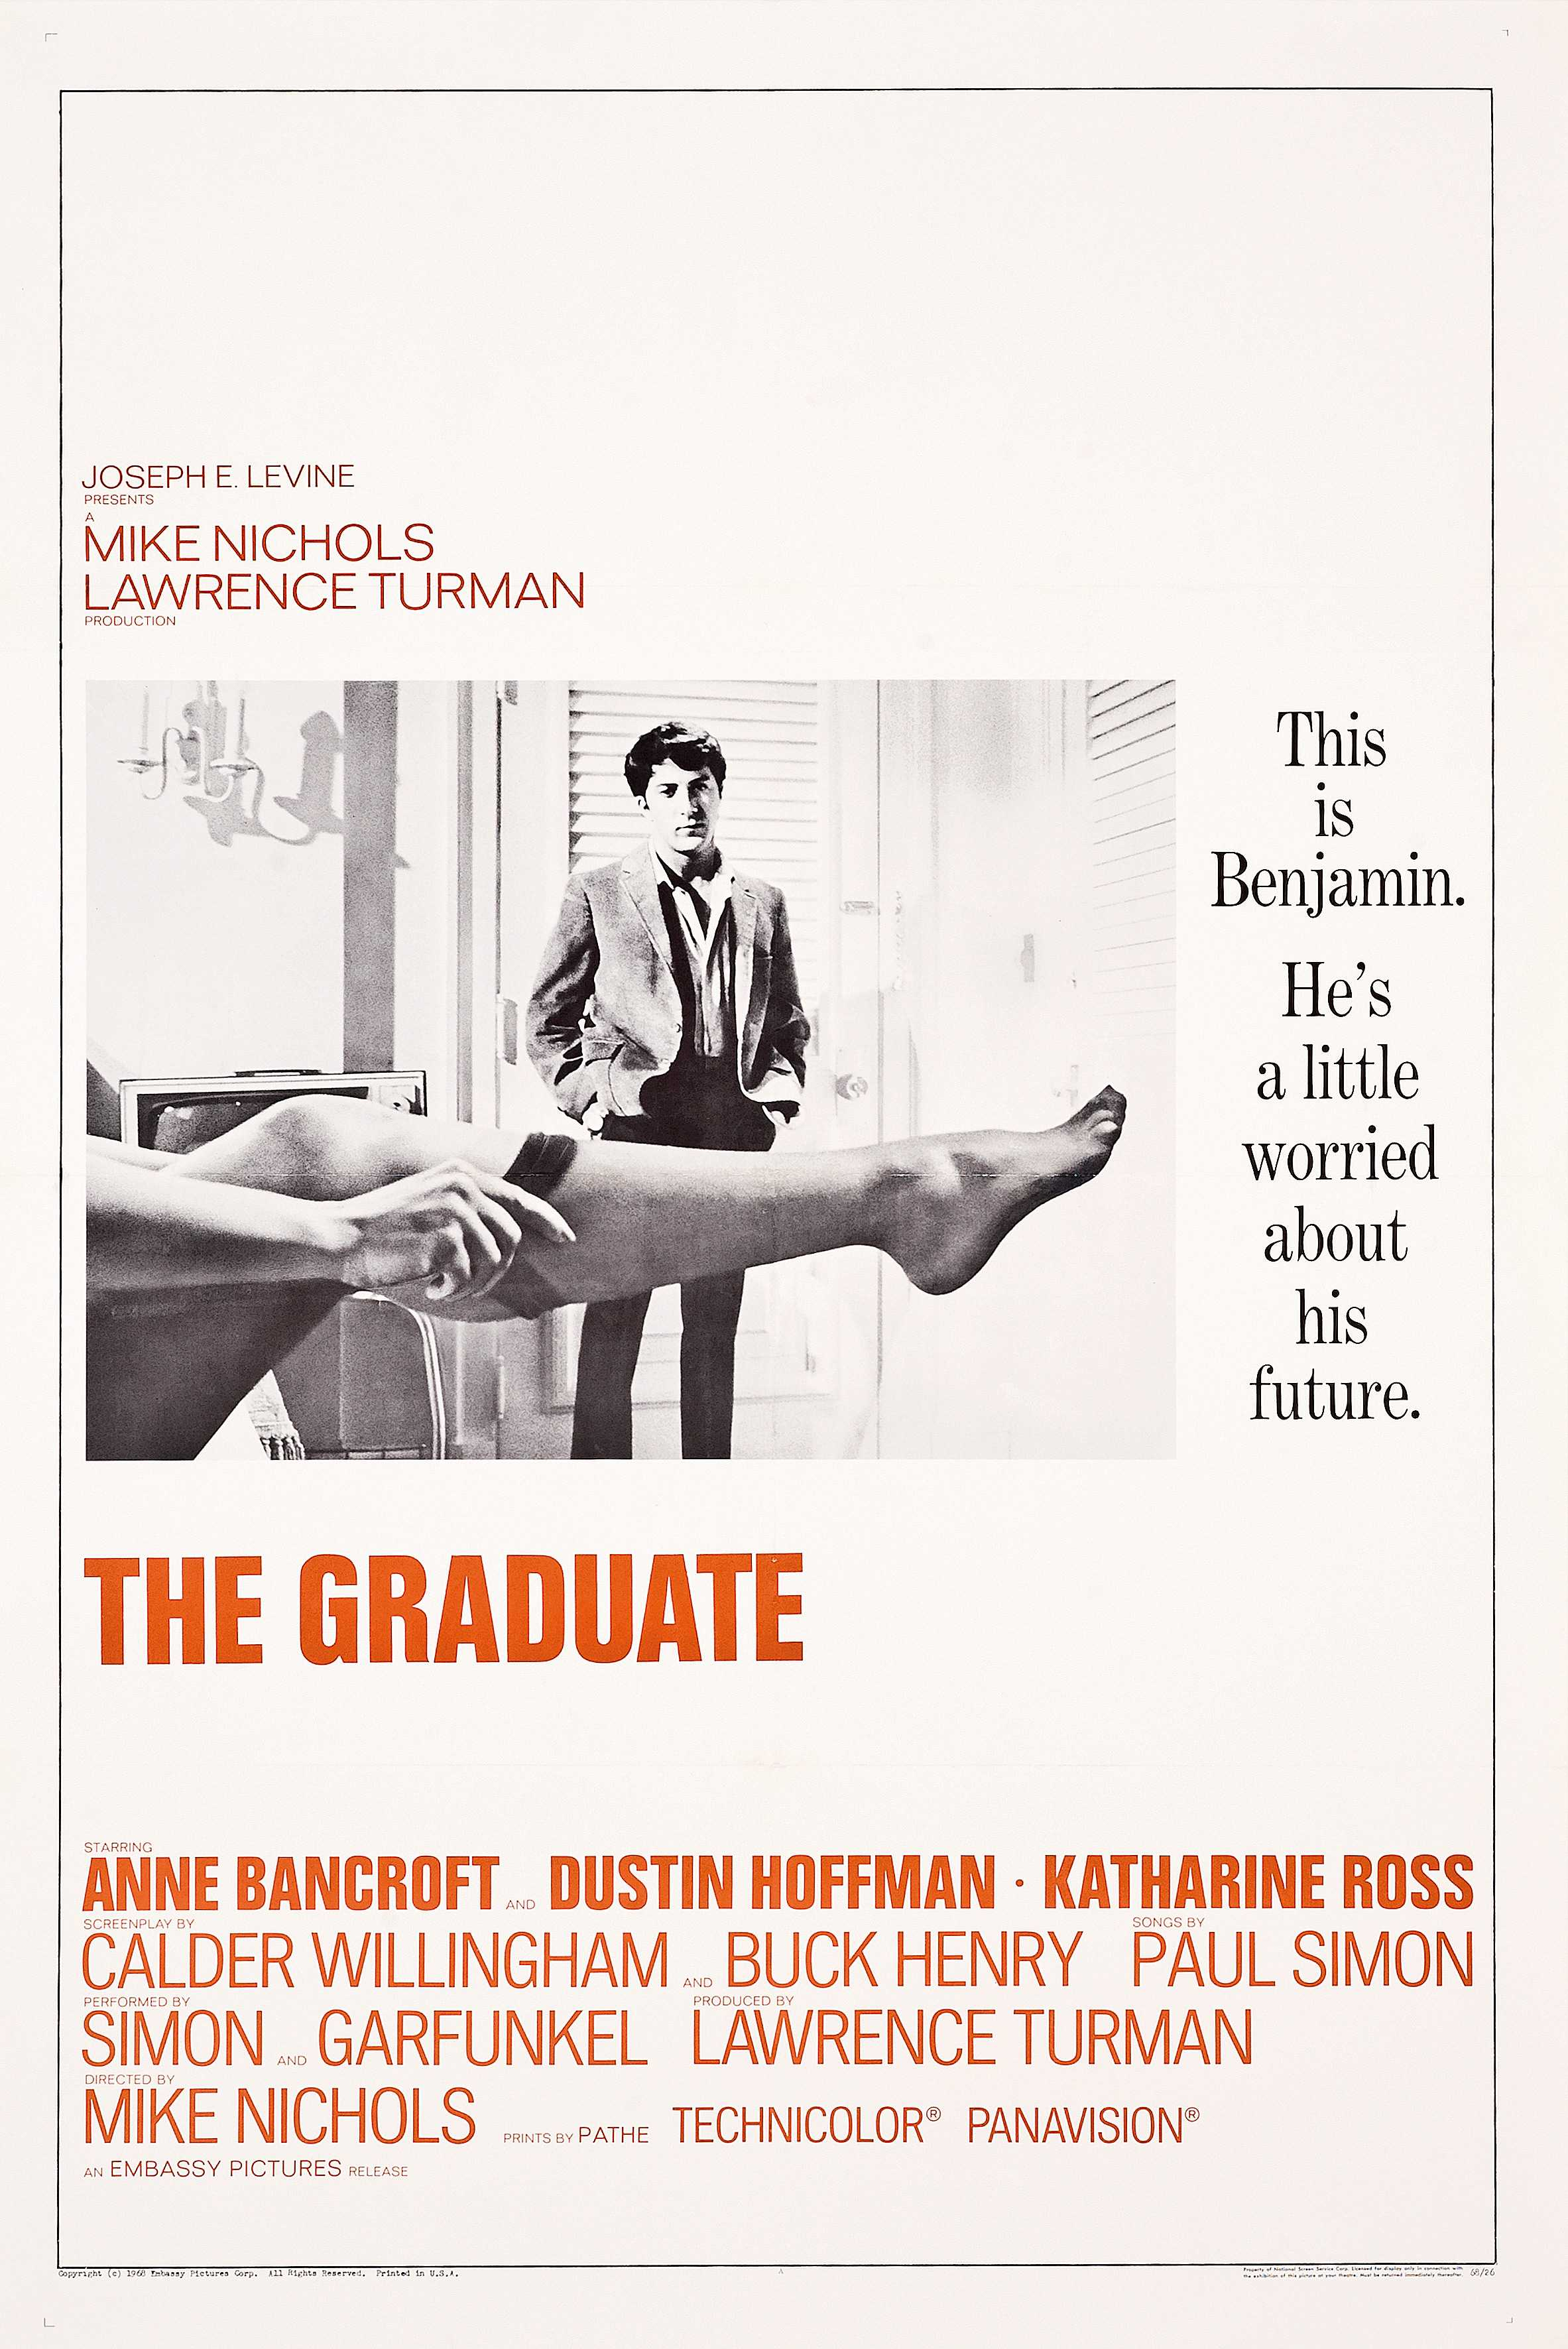 #5: The Graduate (1967)